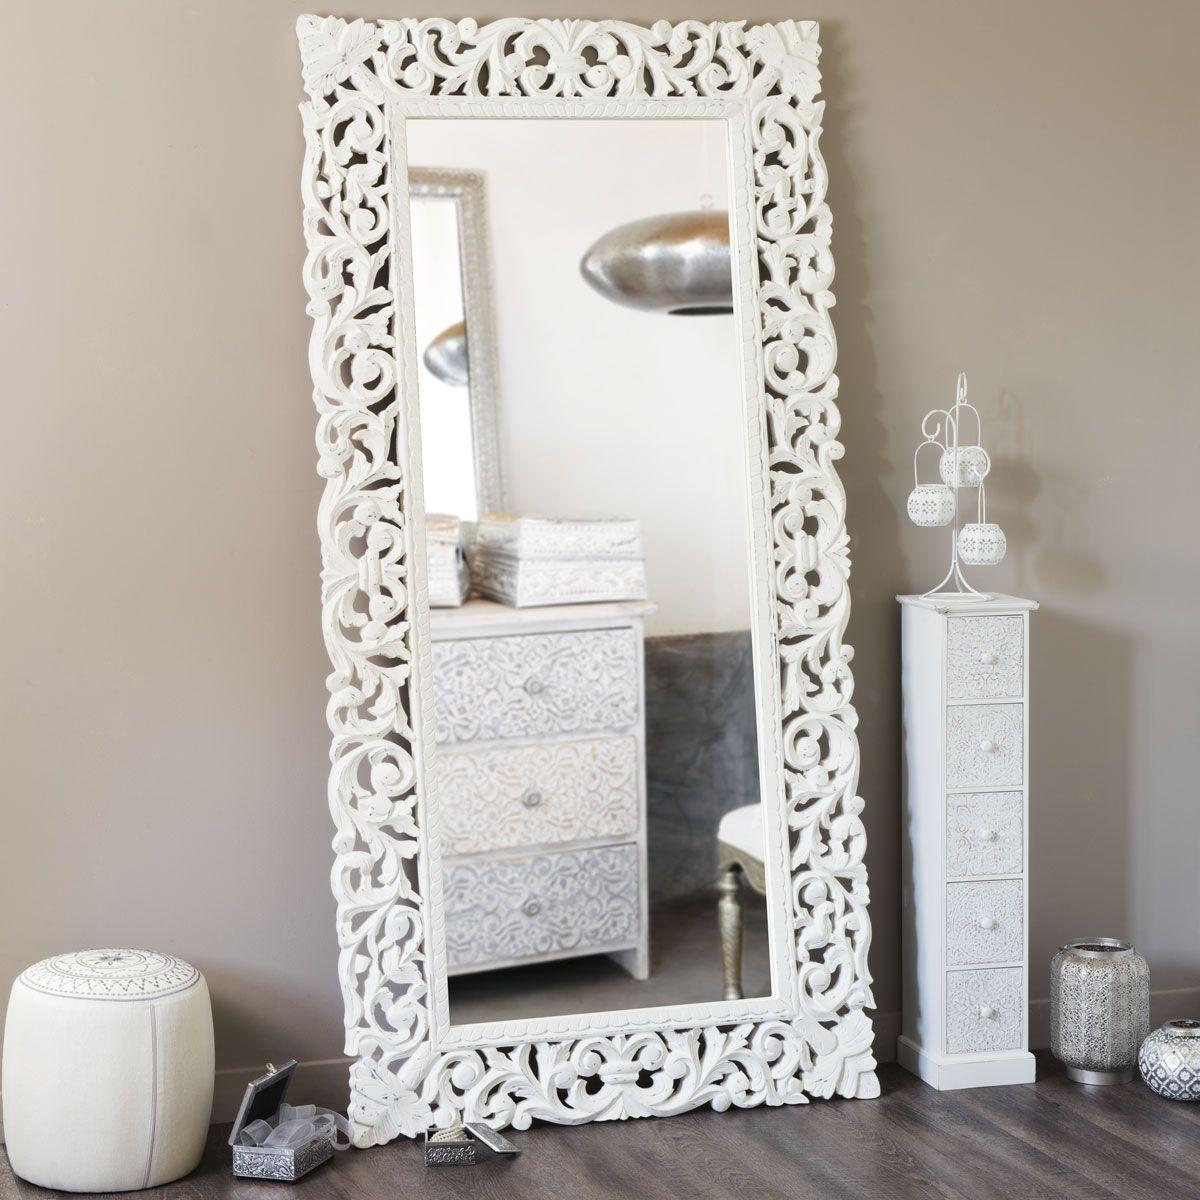 specchio kupang | arredamento | pinterest | bedrooms and house - Camera Da Letto Maison Du Monde